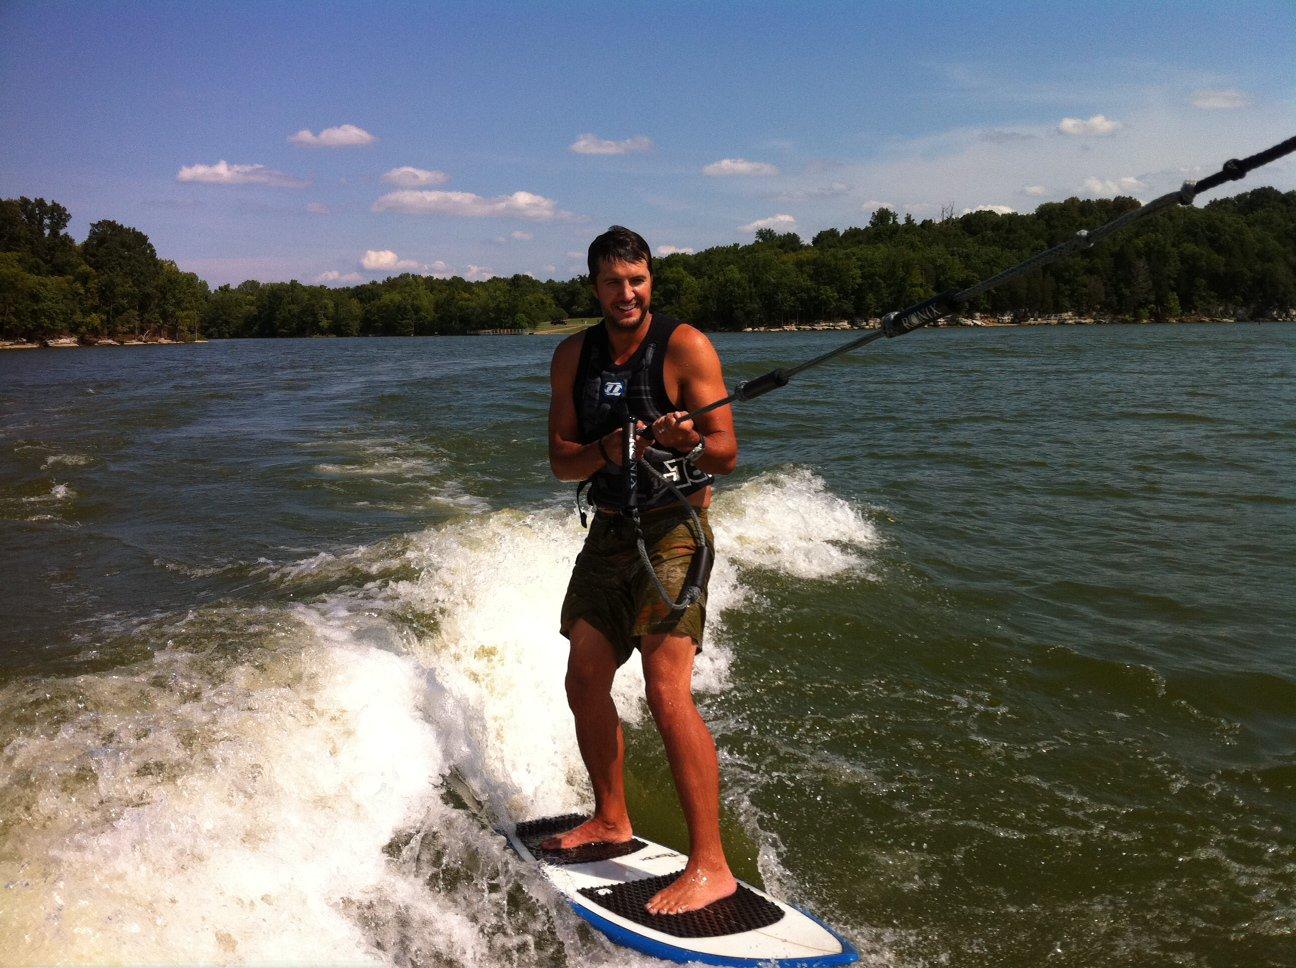 Luke Bryan water sports